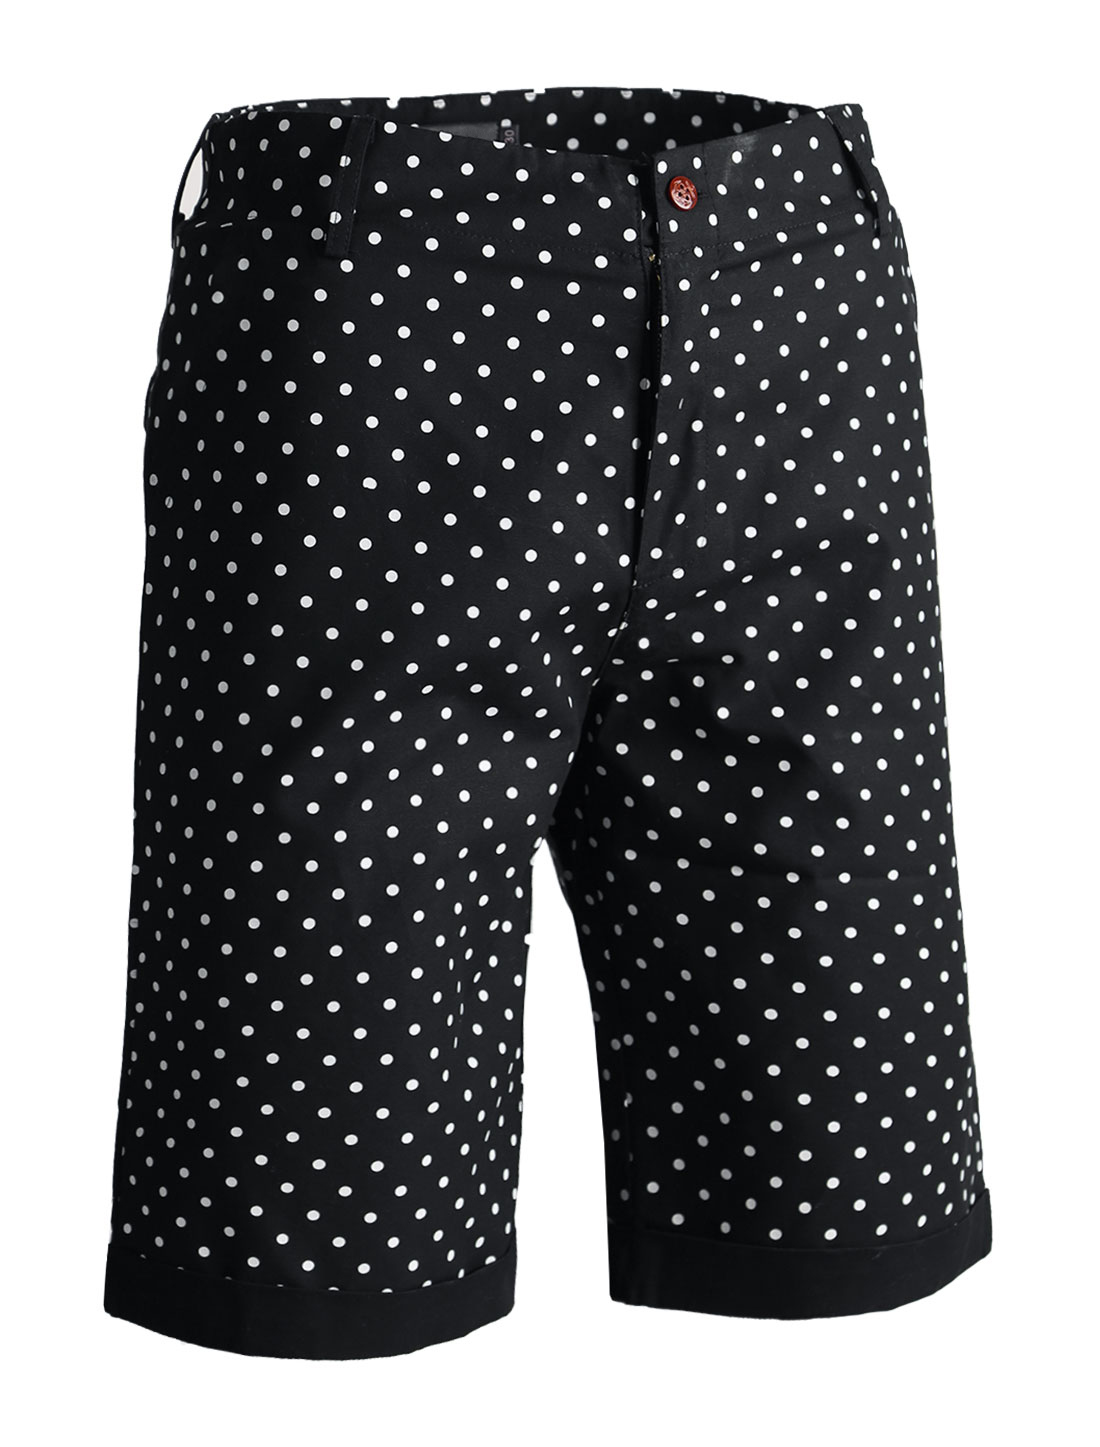 Man Polka Dot Print Cuffed Slim Casual Shorts Black W36